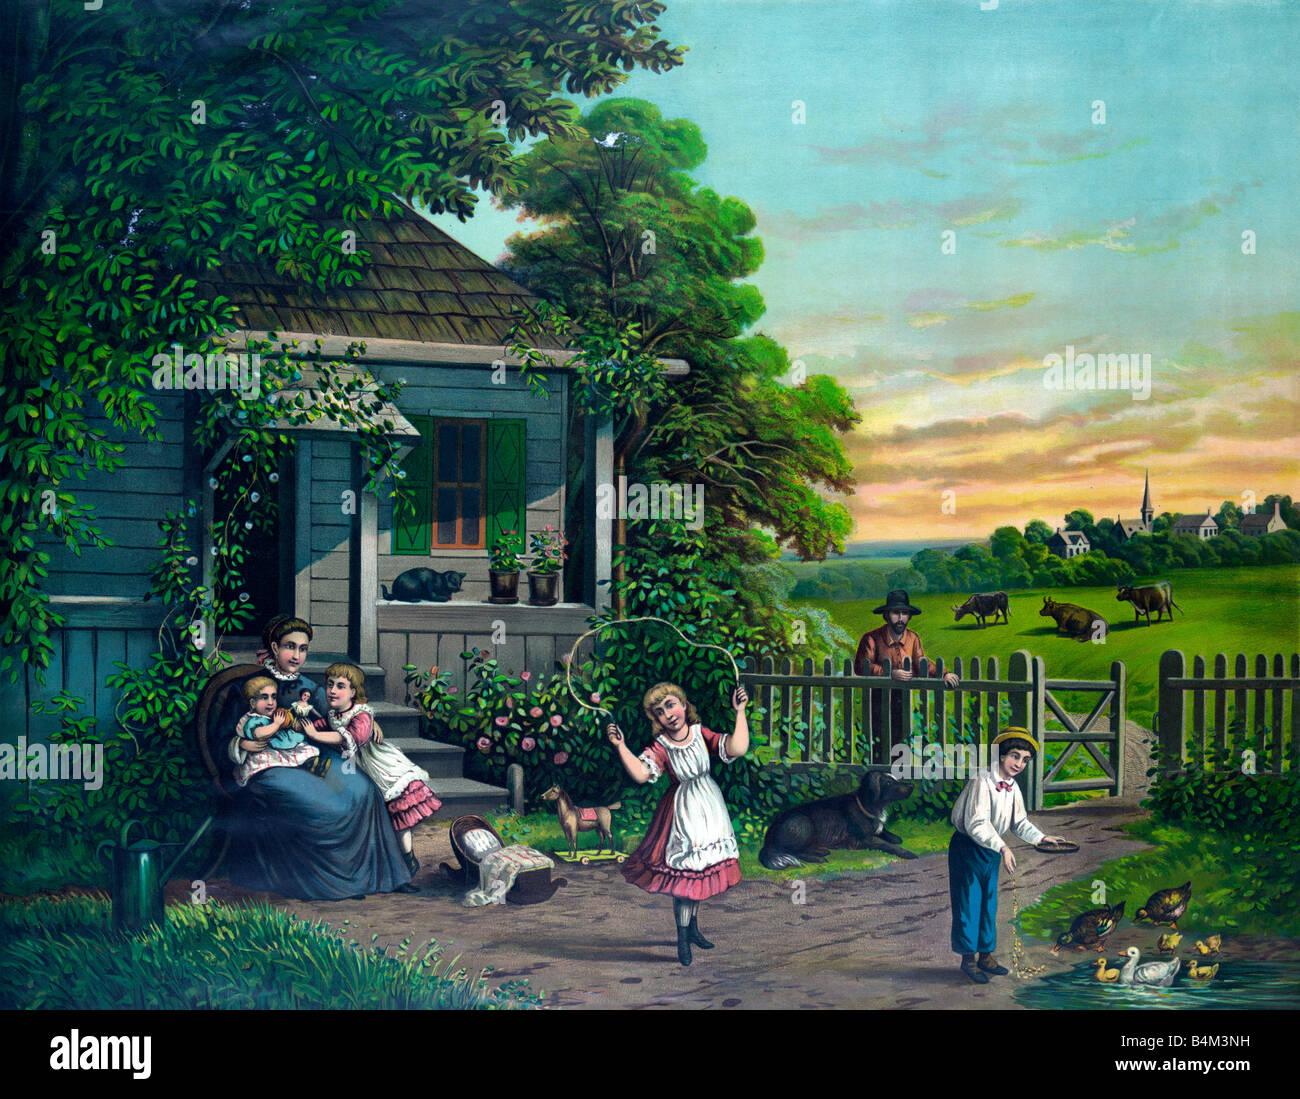 Gott Segne Unsere Heimat Kunst Malerei 1885 Stockfotografie Alamy